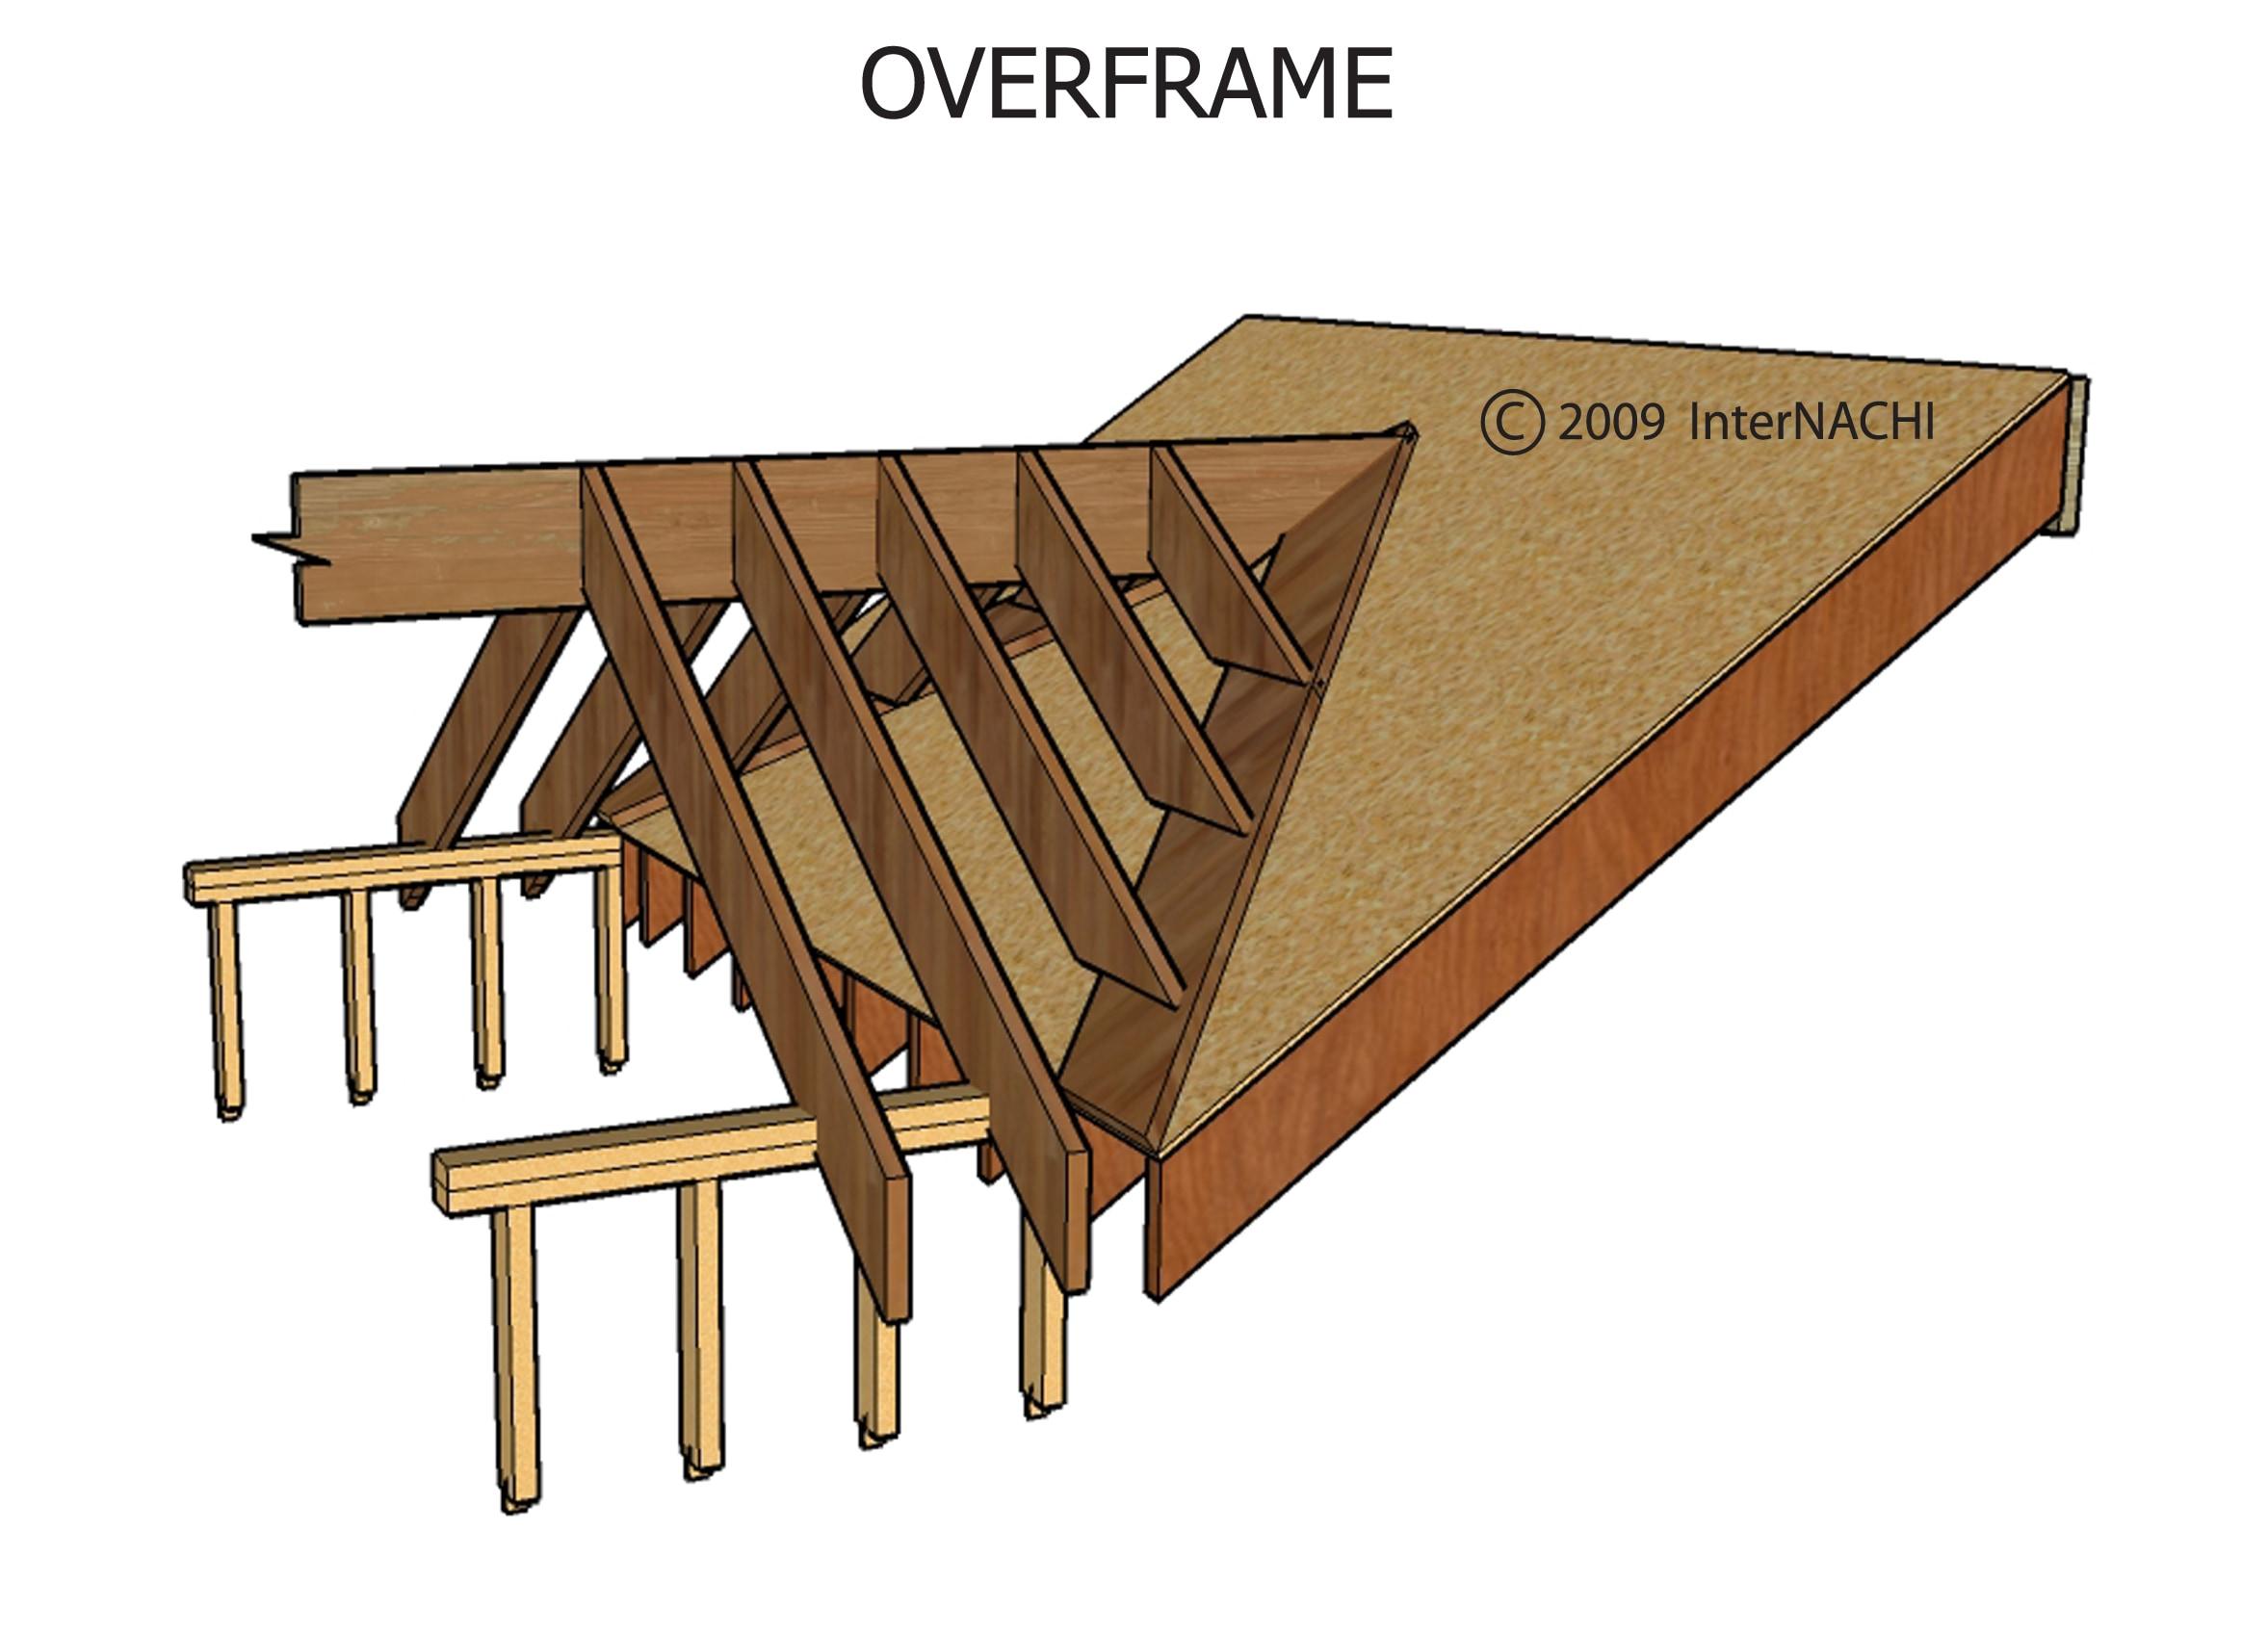 Overframe.